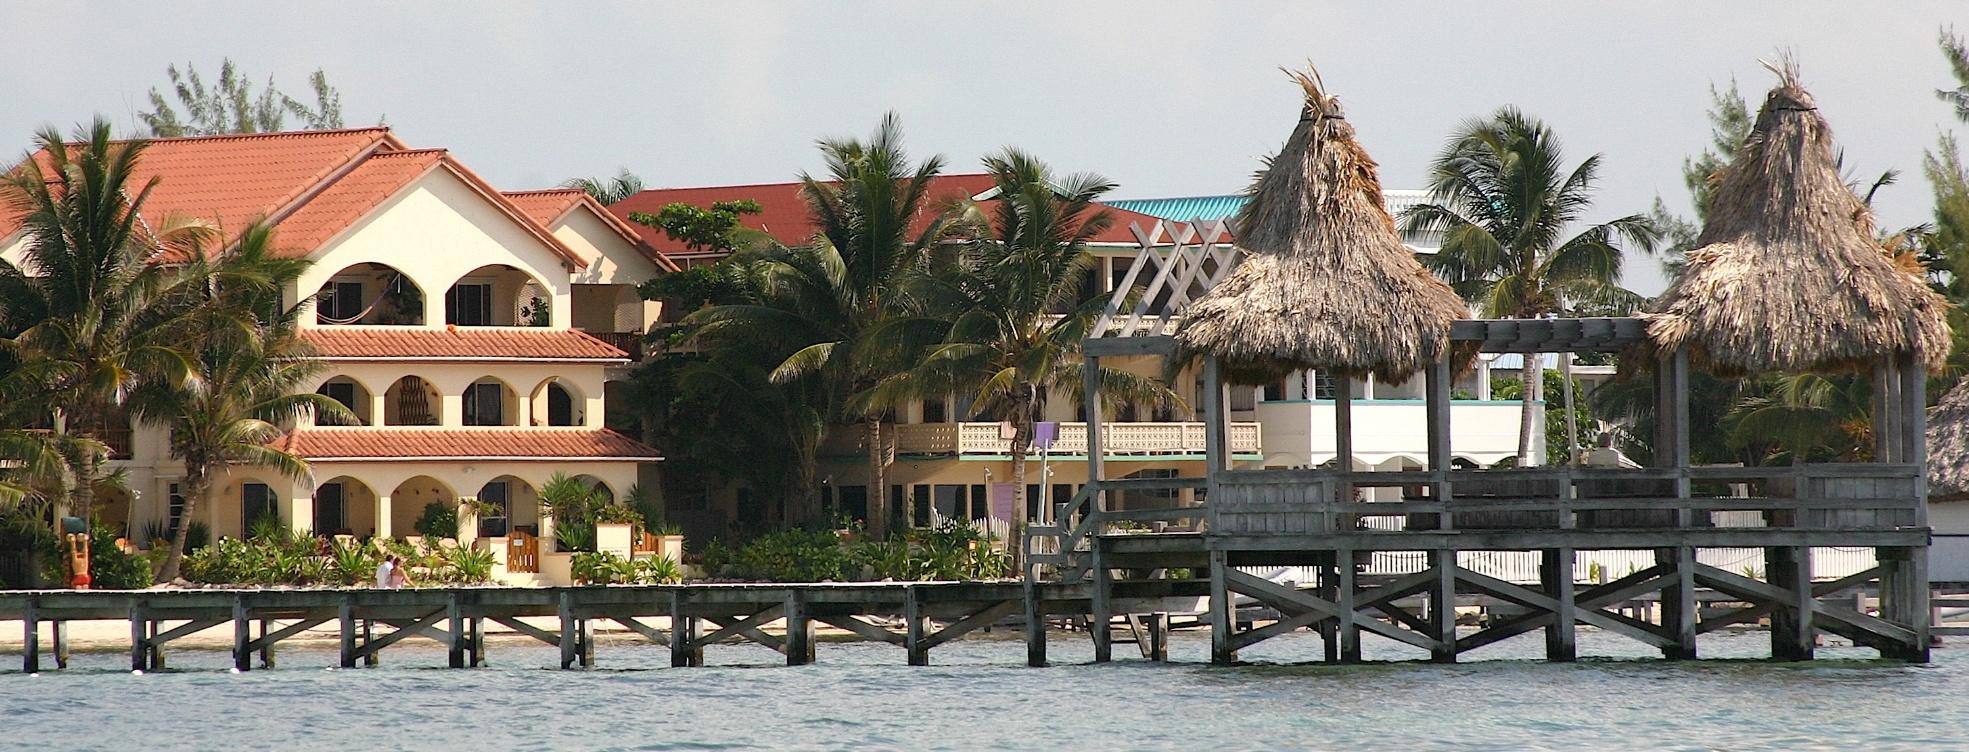 San Pedro Belize-301043-edited.jpg